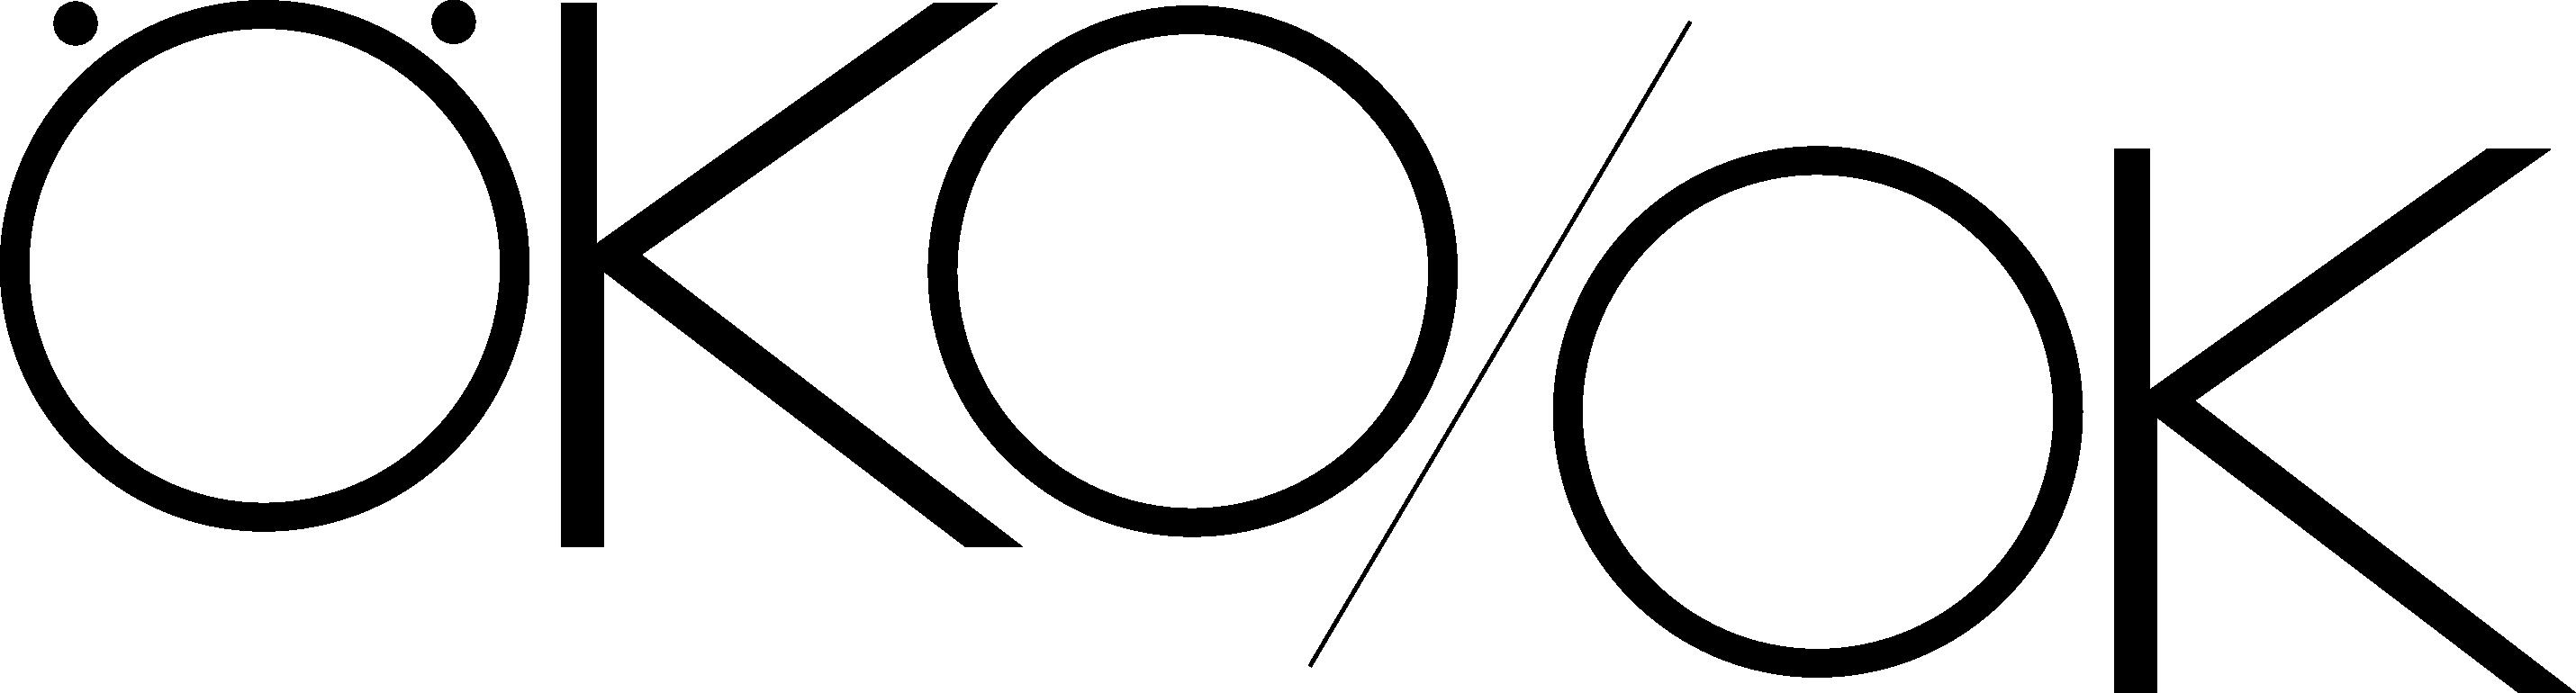 Oeko Gruppe Laupen und Umgebung